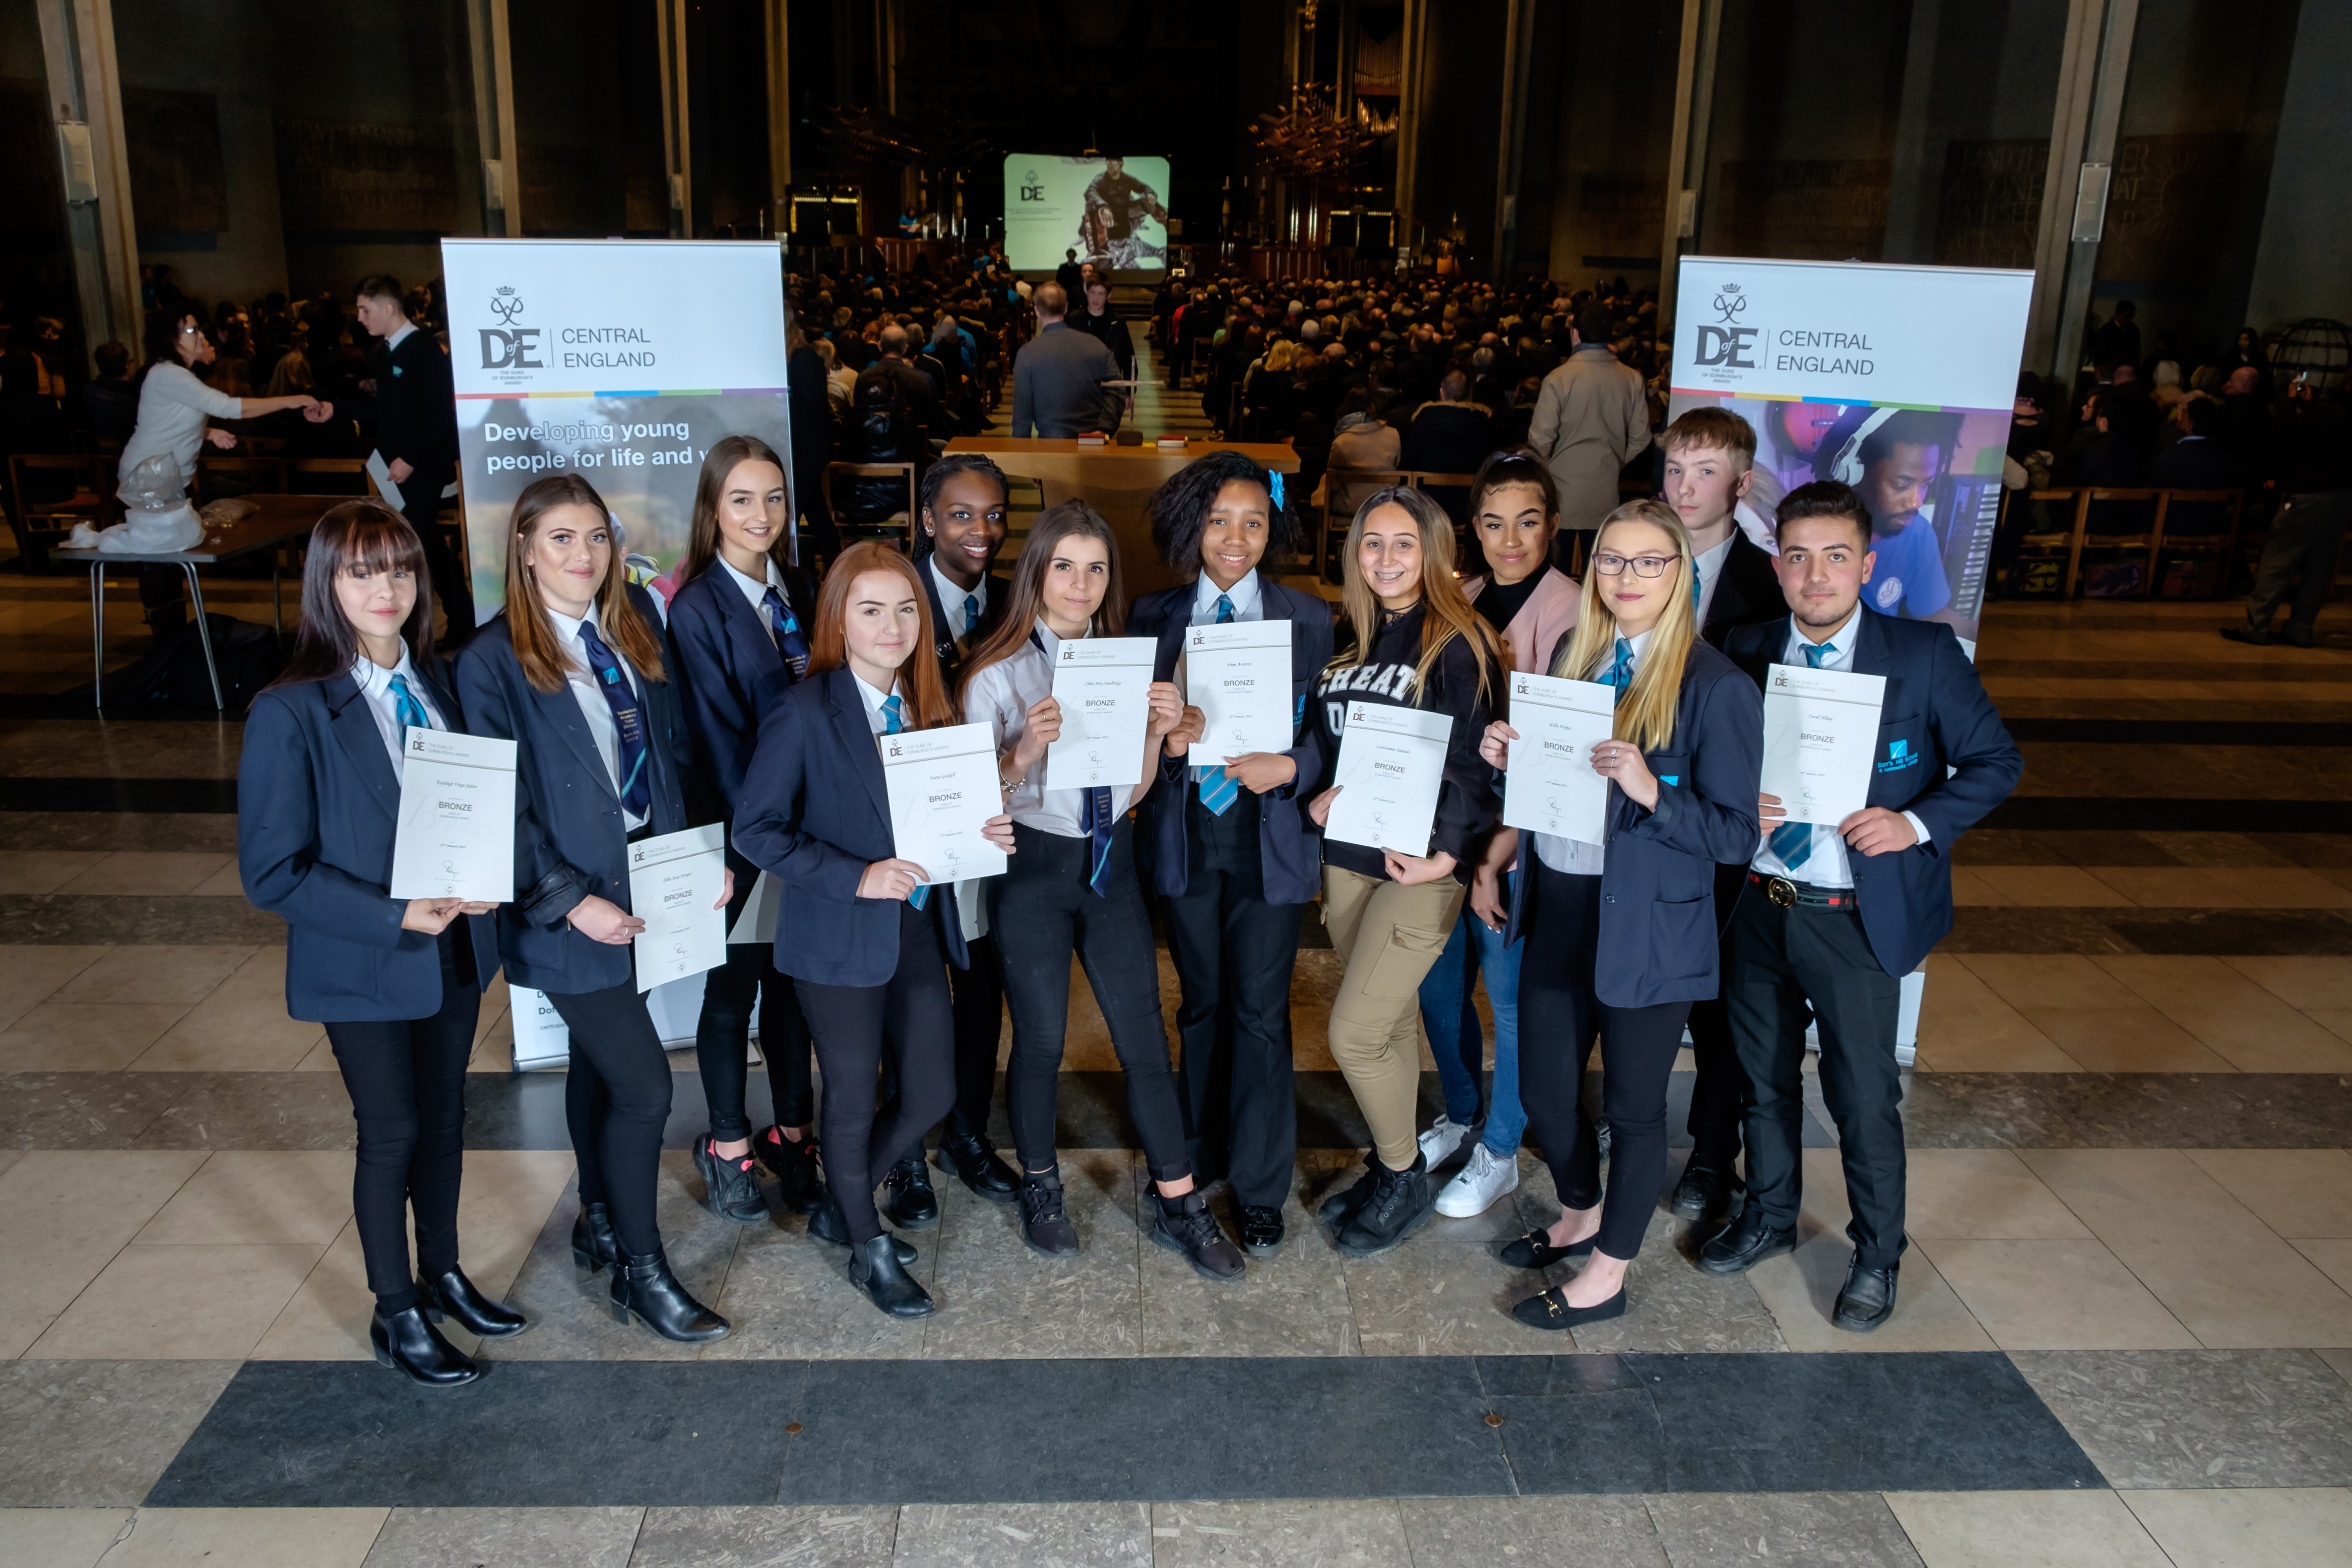 Students awarded bronze at The Duke of Edinburgh Awards